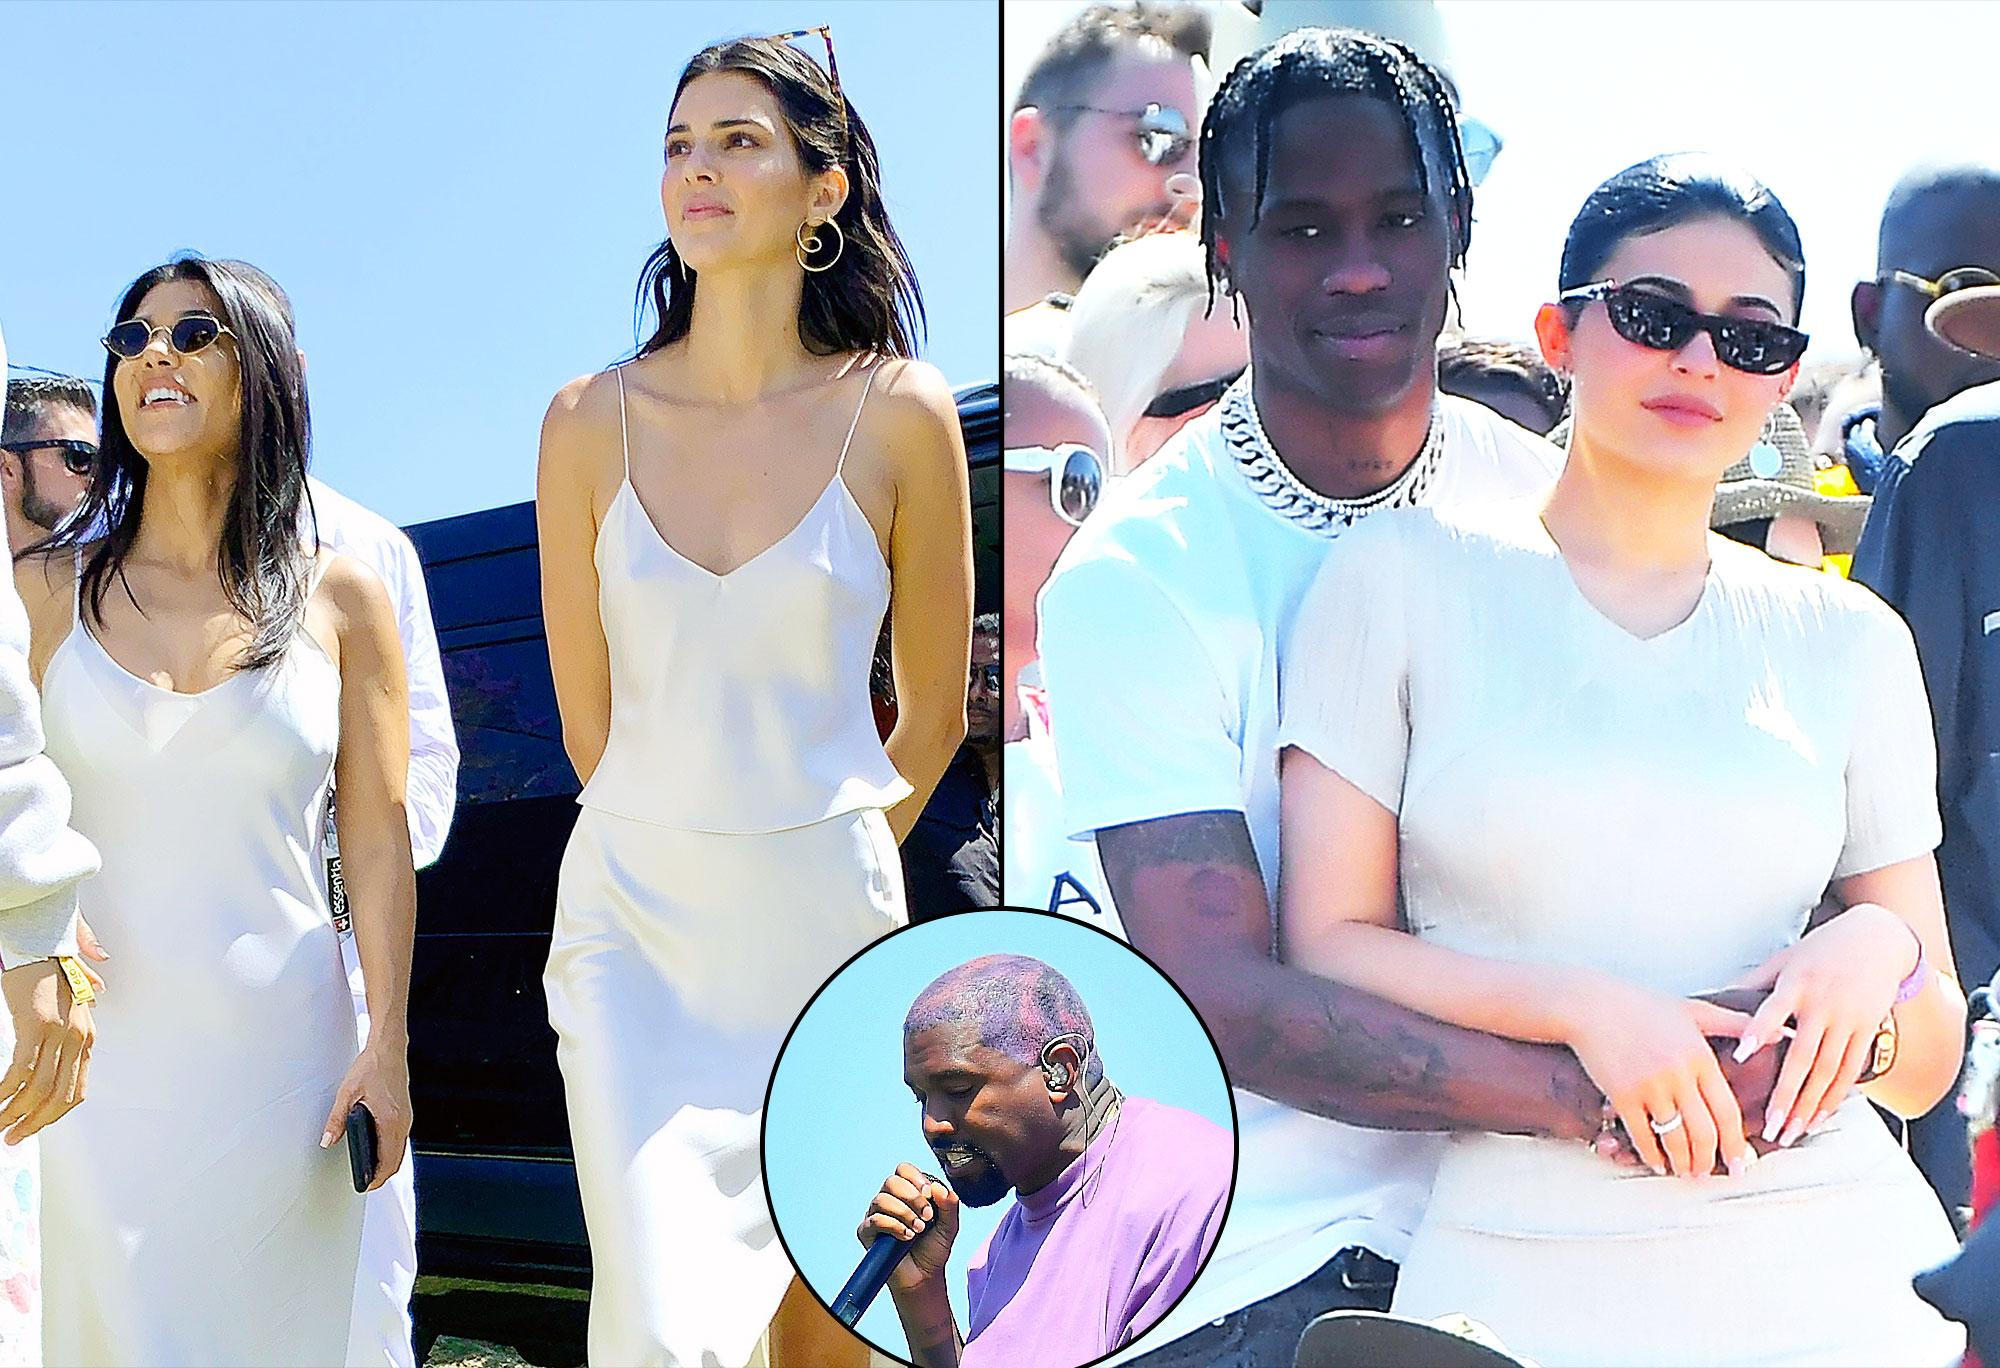 Kourtney Kardashian Kendall Jenner Travis Scott Kylie Jenner Kanye West Easter Performance Coachella 2019